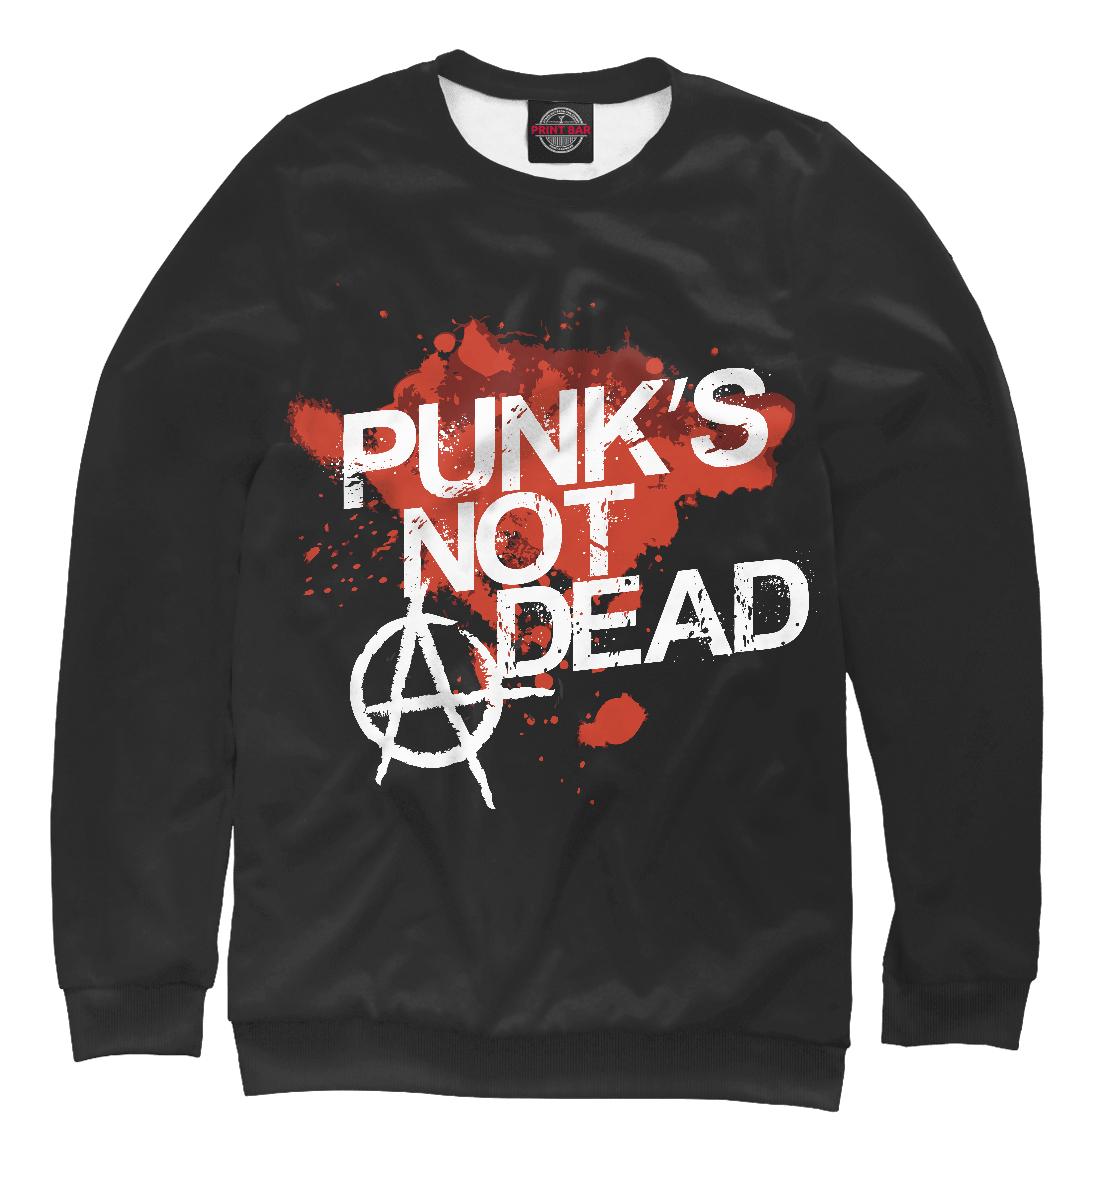 Купить Punks not dead, Printbar, Свитшоты, MZK-214275-swi-1